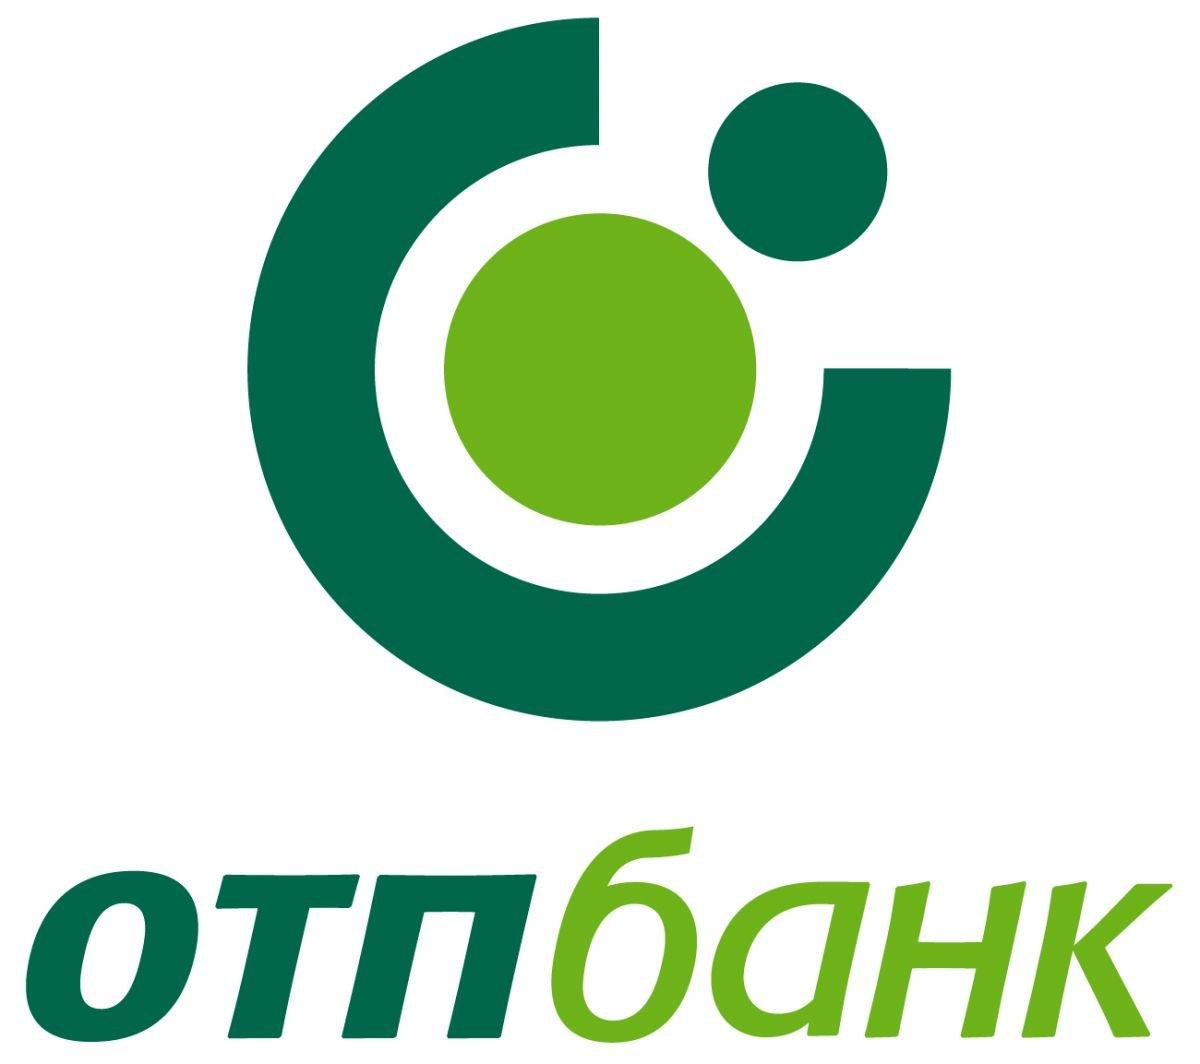 kredit-po-dvum-dokumentam_19